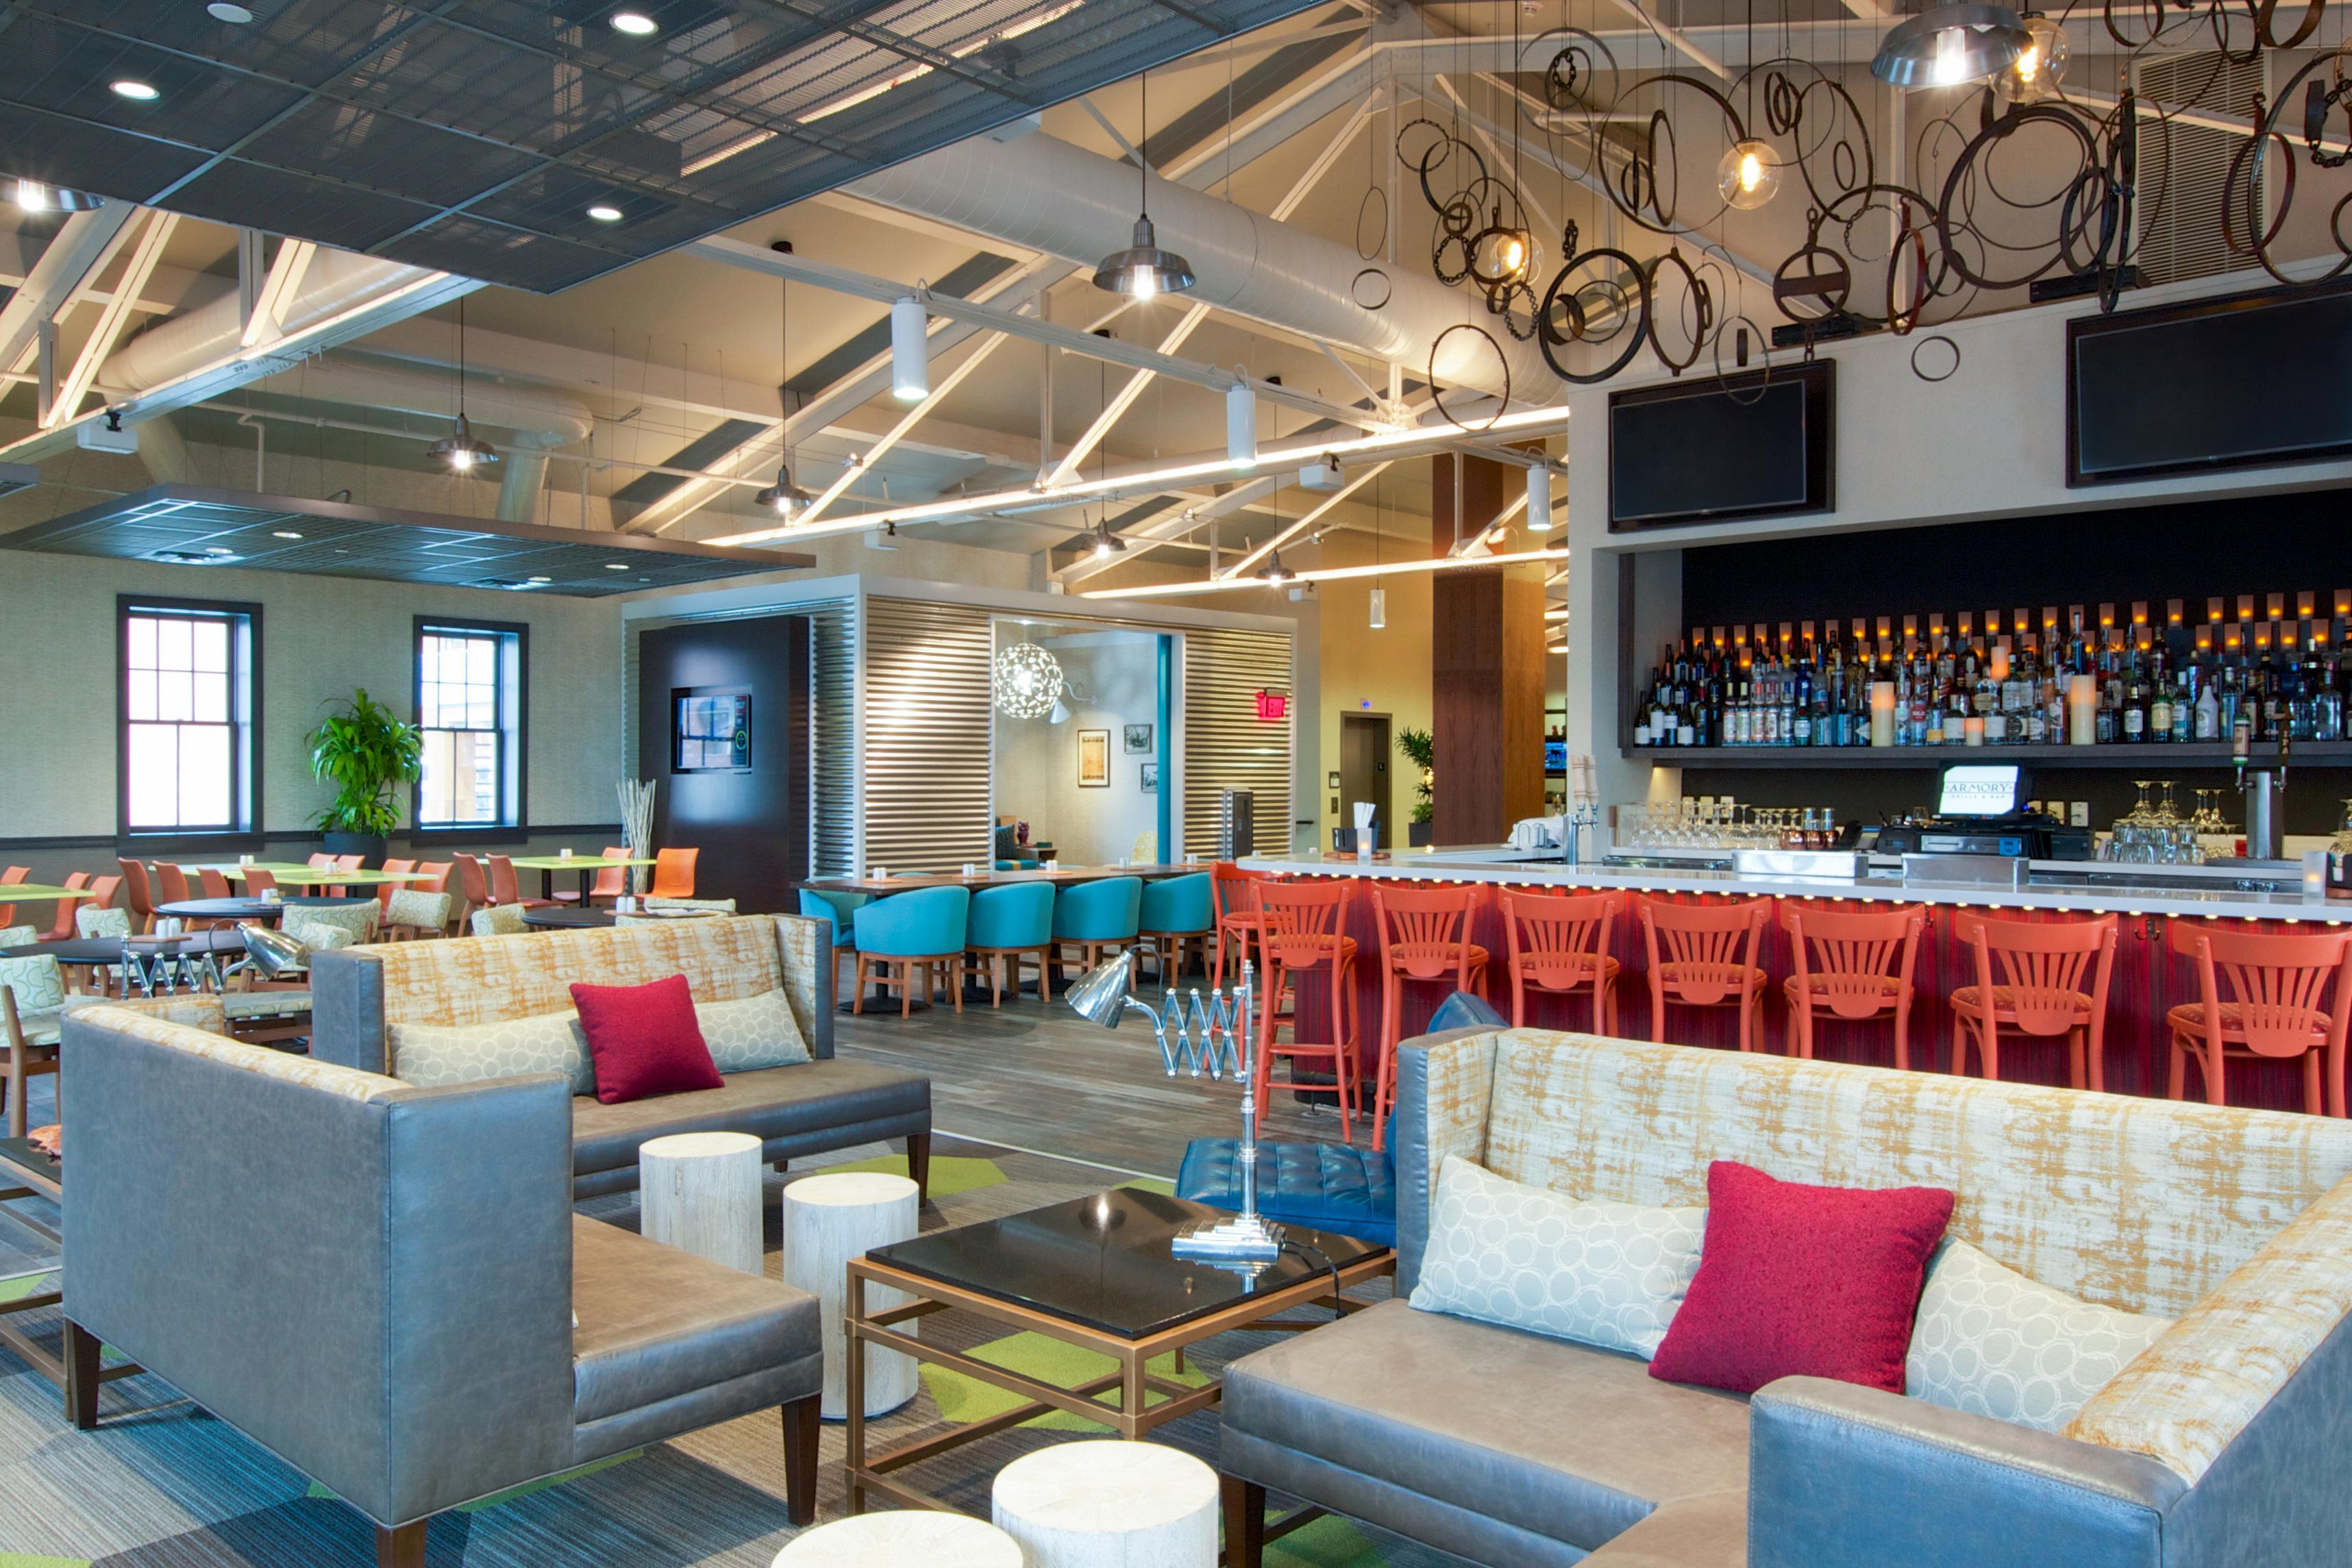 hilton garden inn burlington downtown vt 2017 hotel review